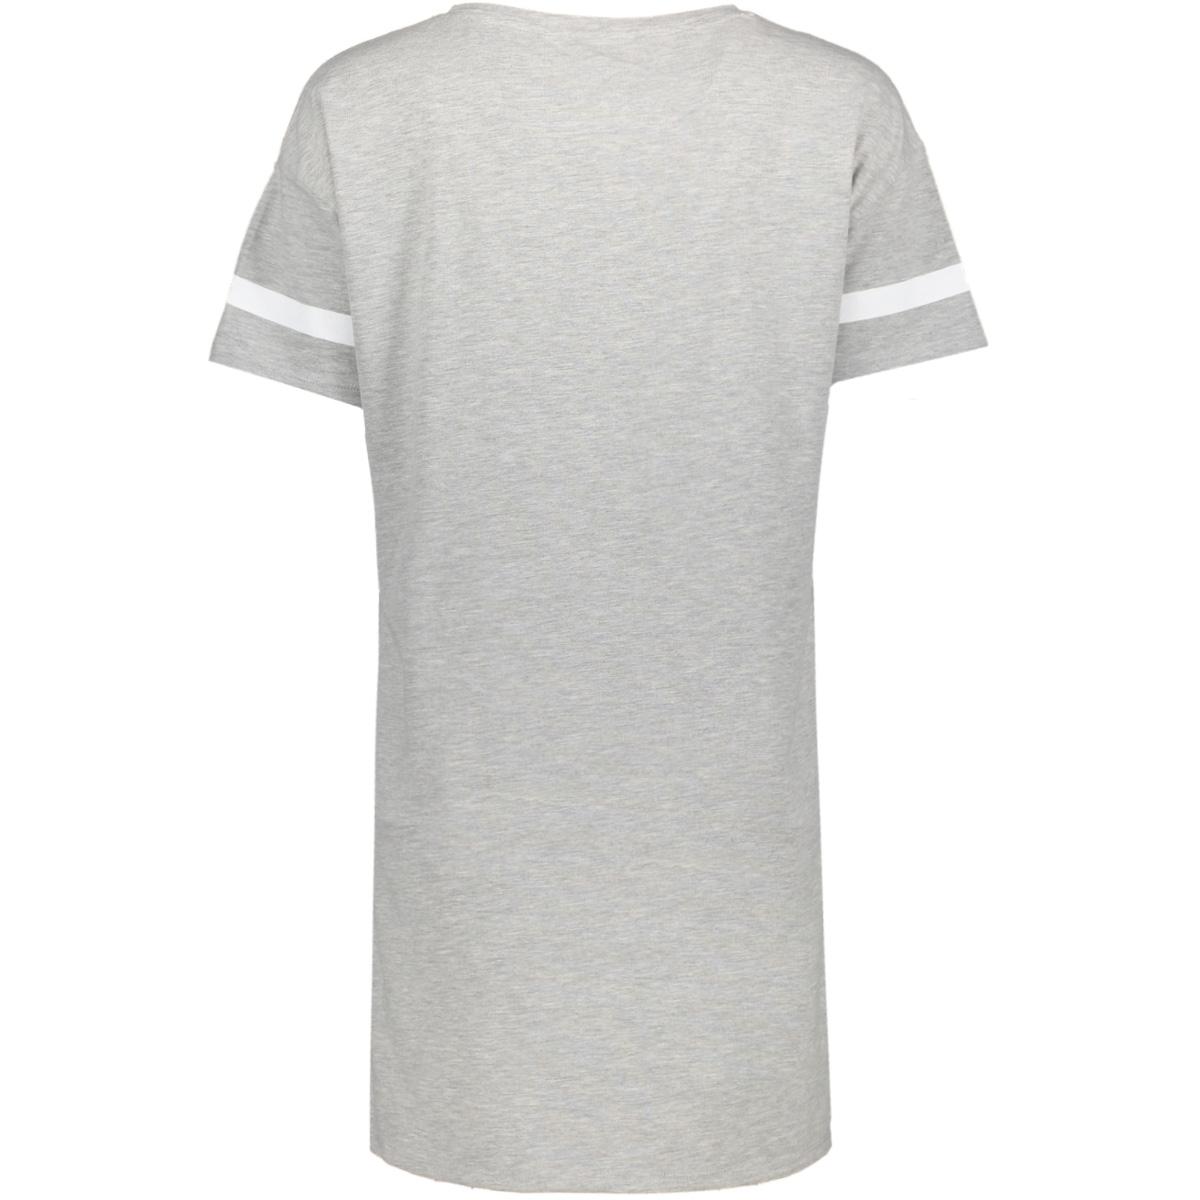 onlsquad brooklyn s/s short dress b 15144595 only t-shirt light grey melange